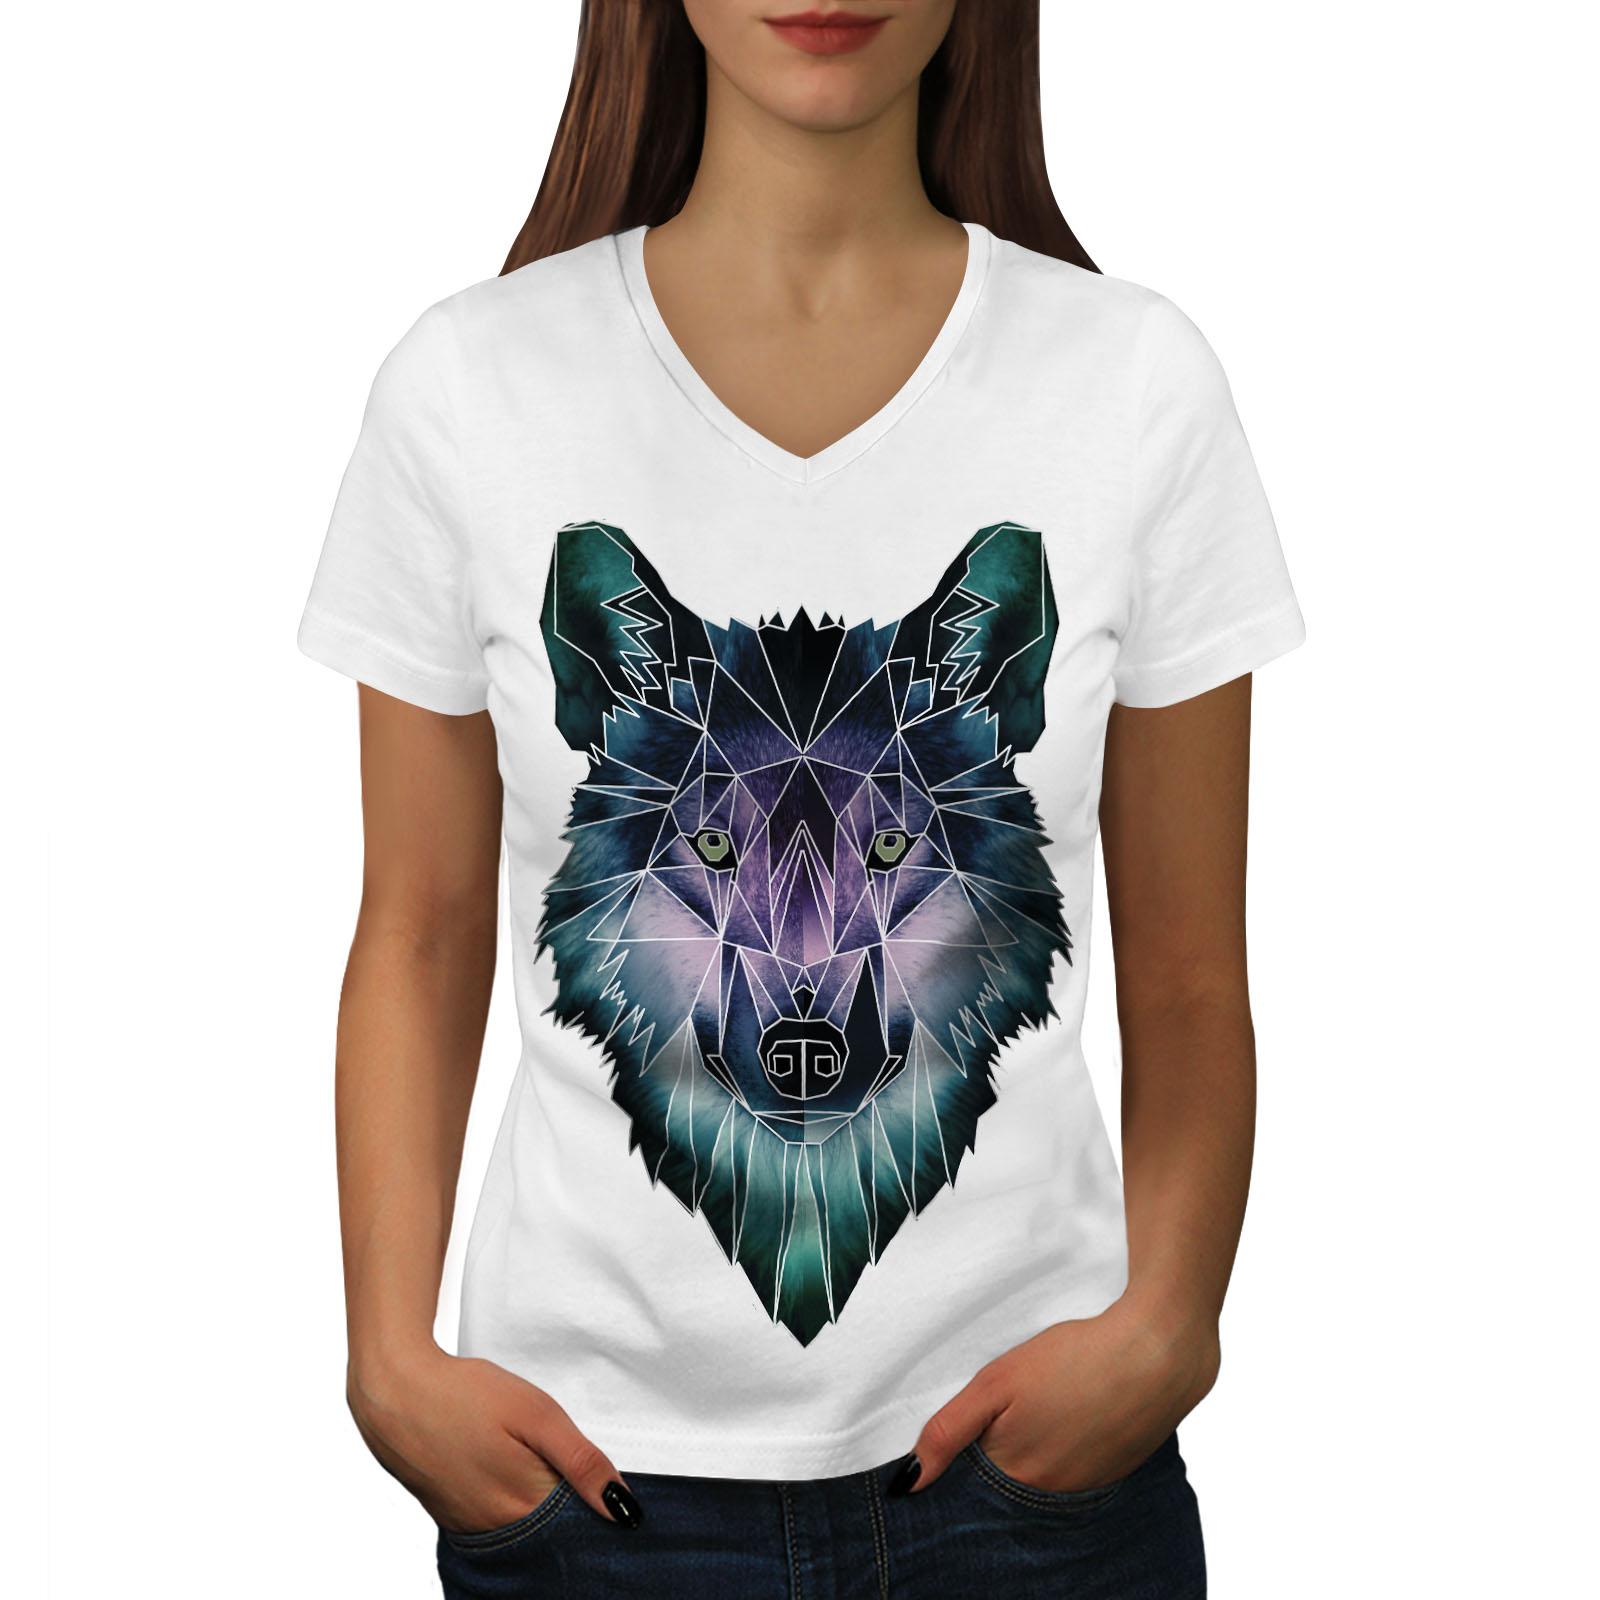 Wellcoda-Psychodelic-Wolf-Womens-V-Neck-T-shirt-Crystal-Graphic-Design-Tee thumbnail 7